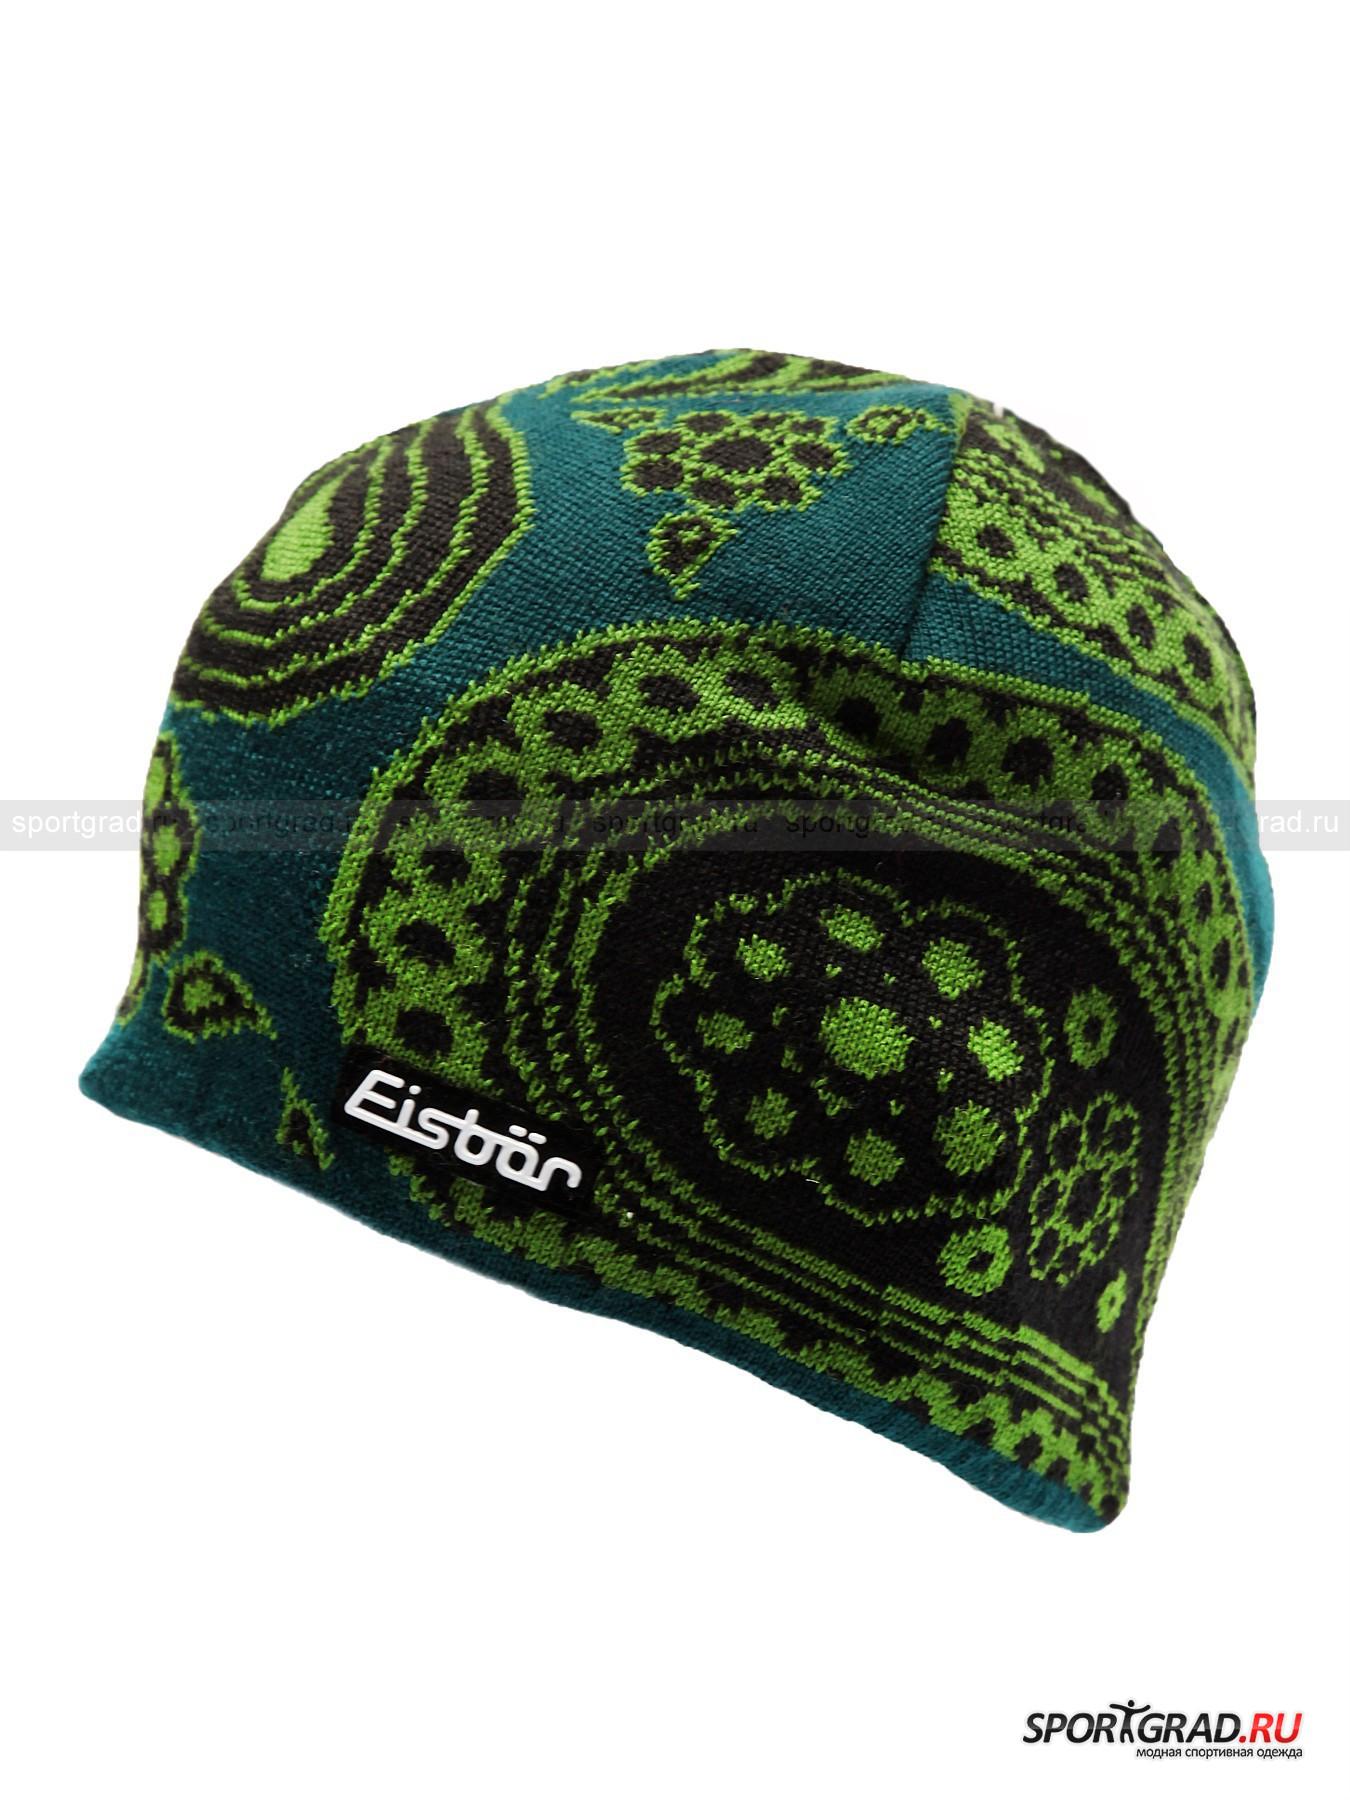 шапка-мужская-горнолыжная-adina-mu-eisbear